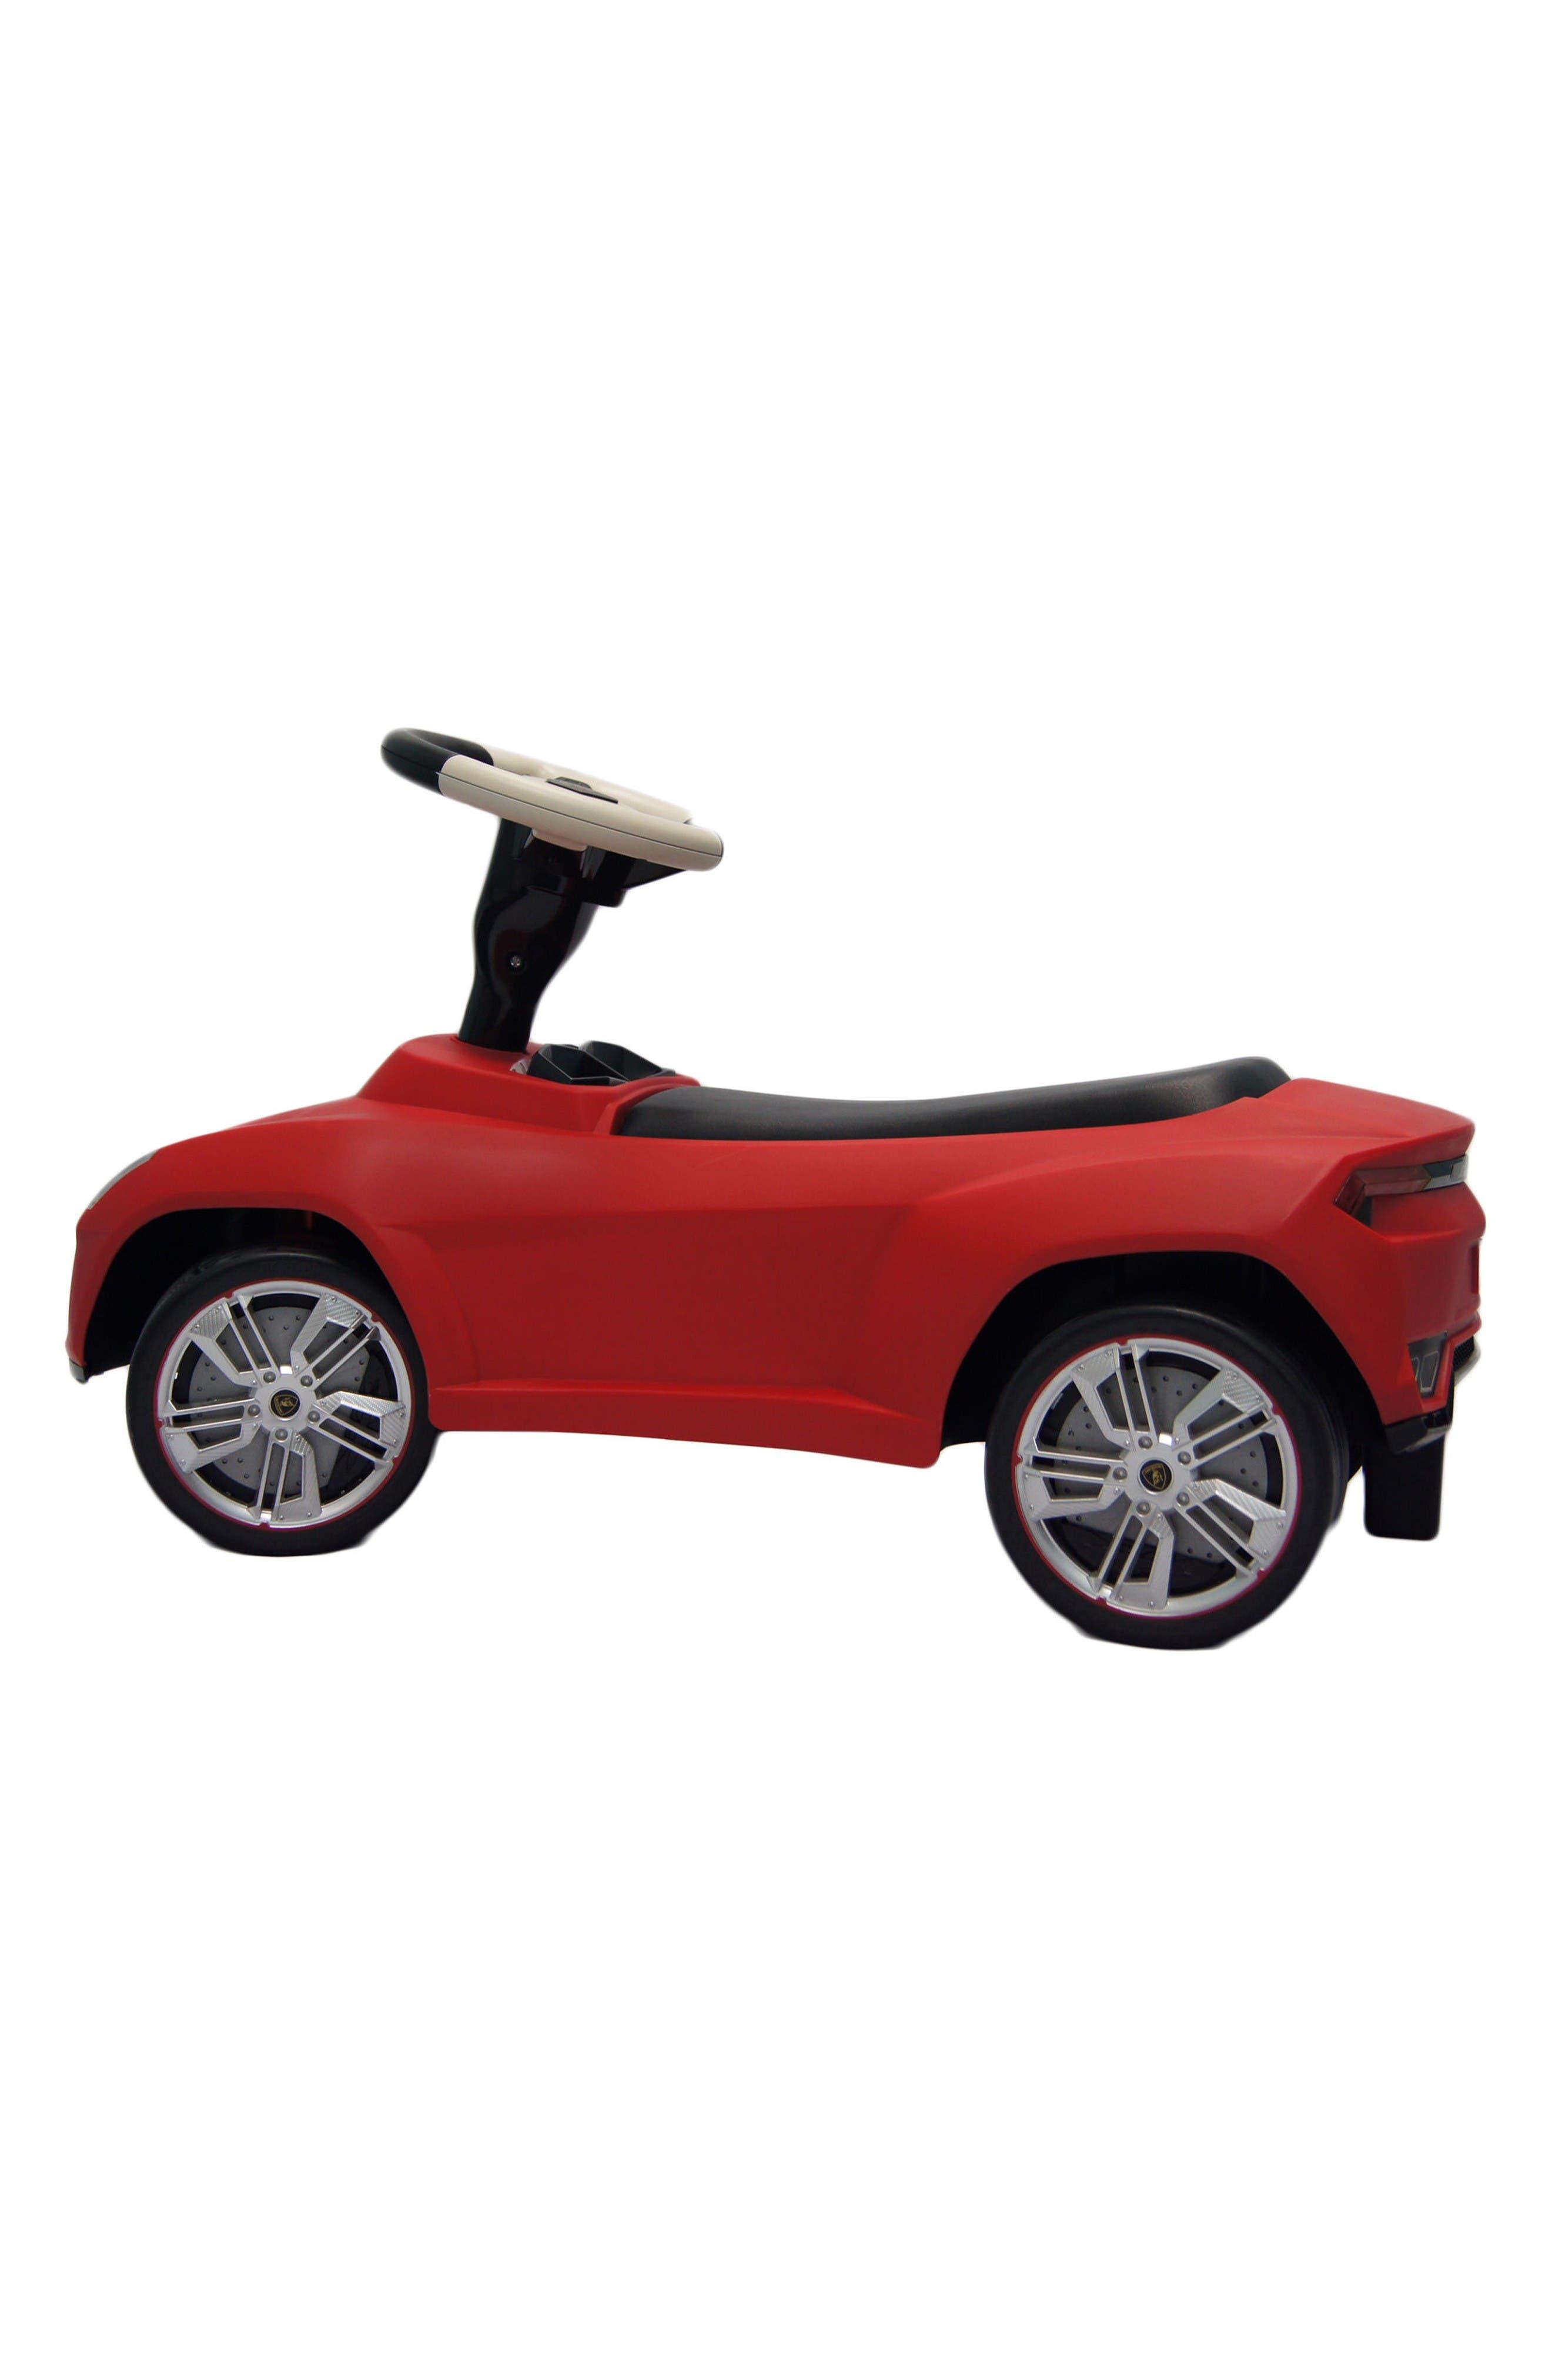 Best Ride on Cars Lamborghini Urus Ride-On Push Car